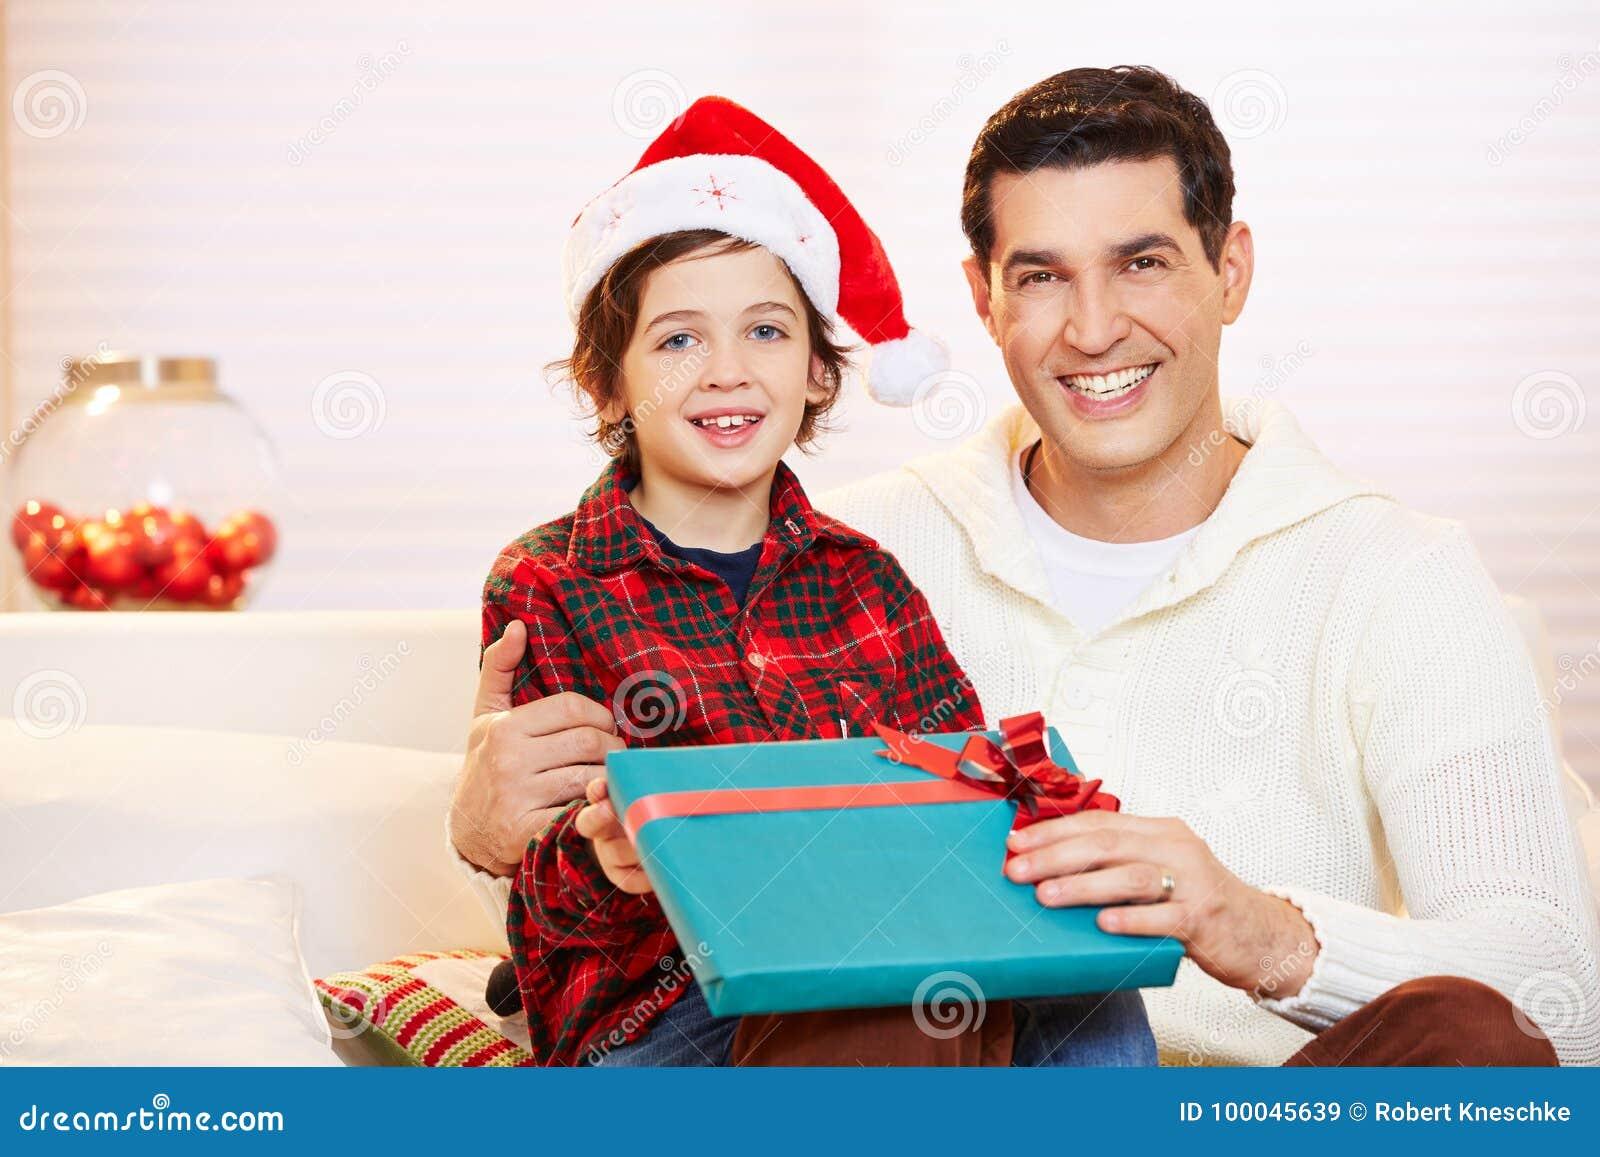 18 year old girl christmas gifts